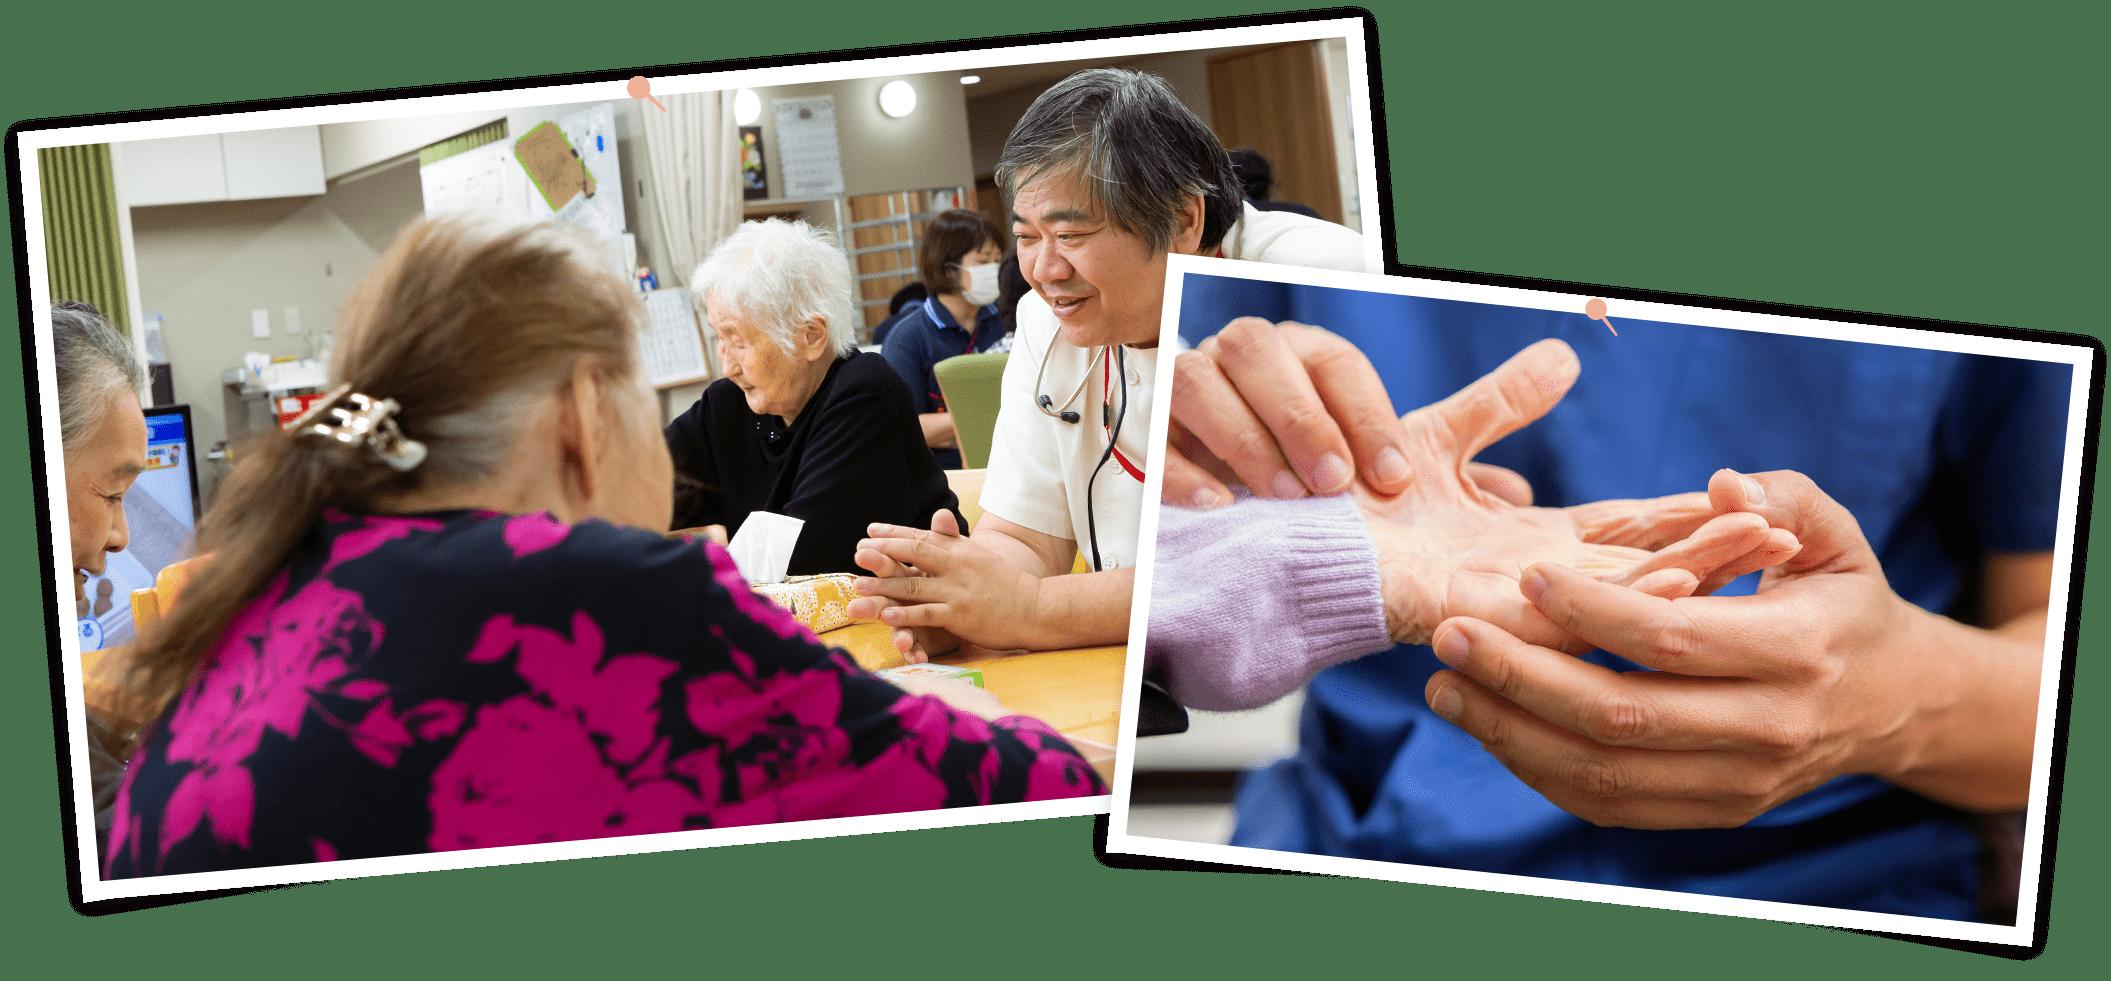 看護小規模多機能型介護イメージ